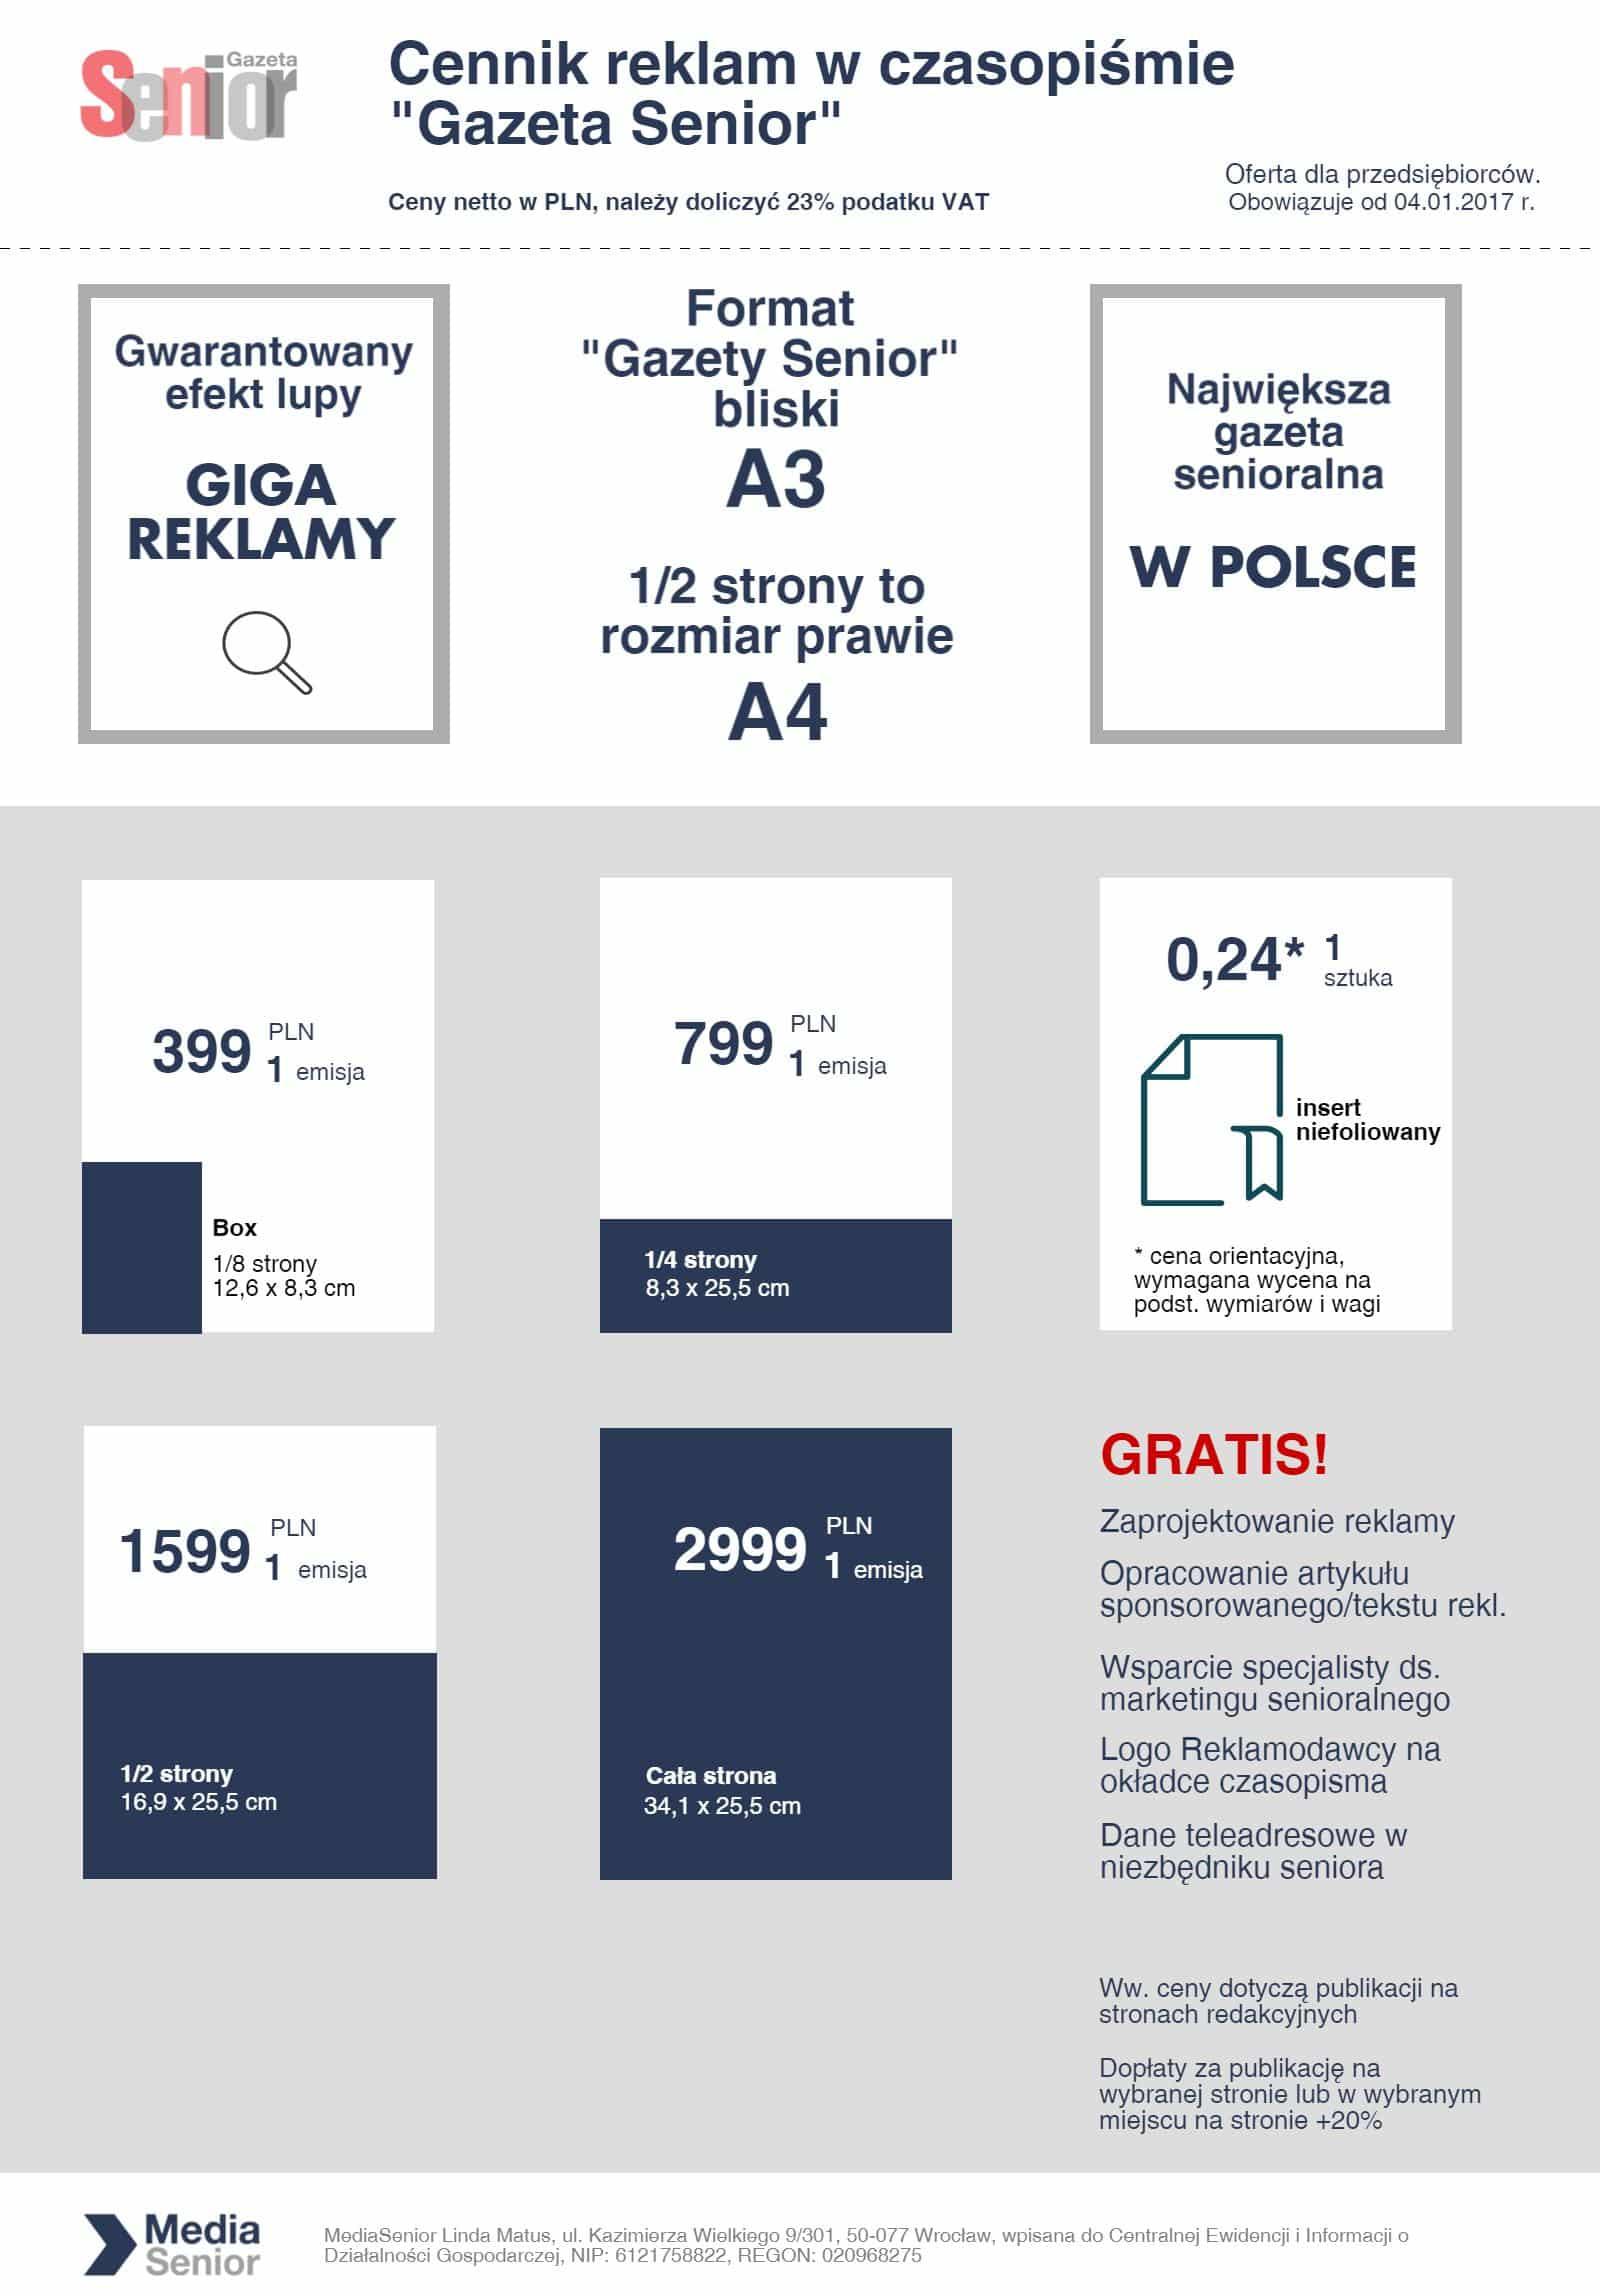 Cennik reklam Gazeta Senior 13.07.17 (2)